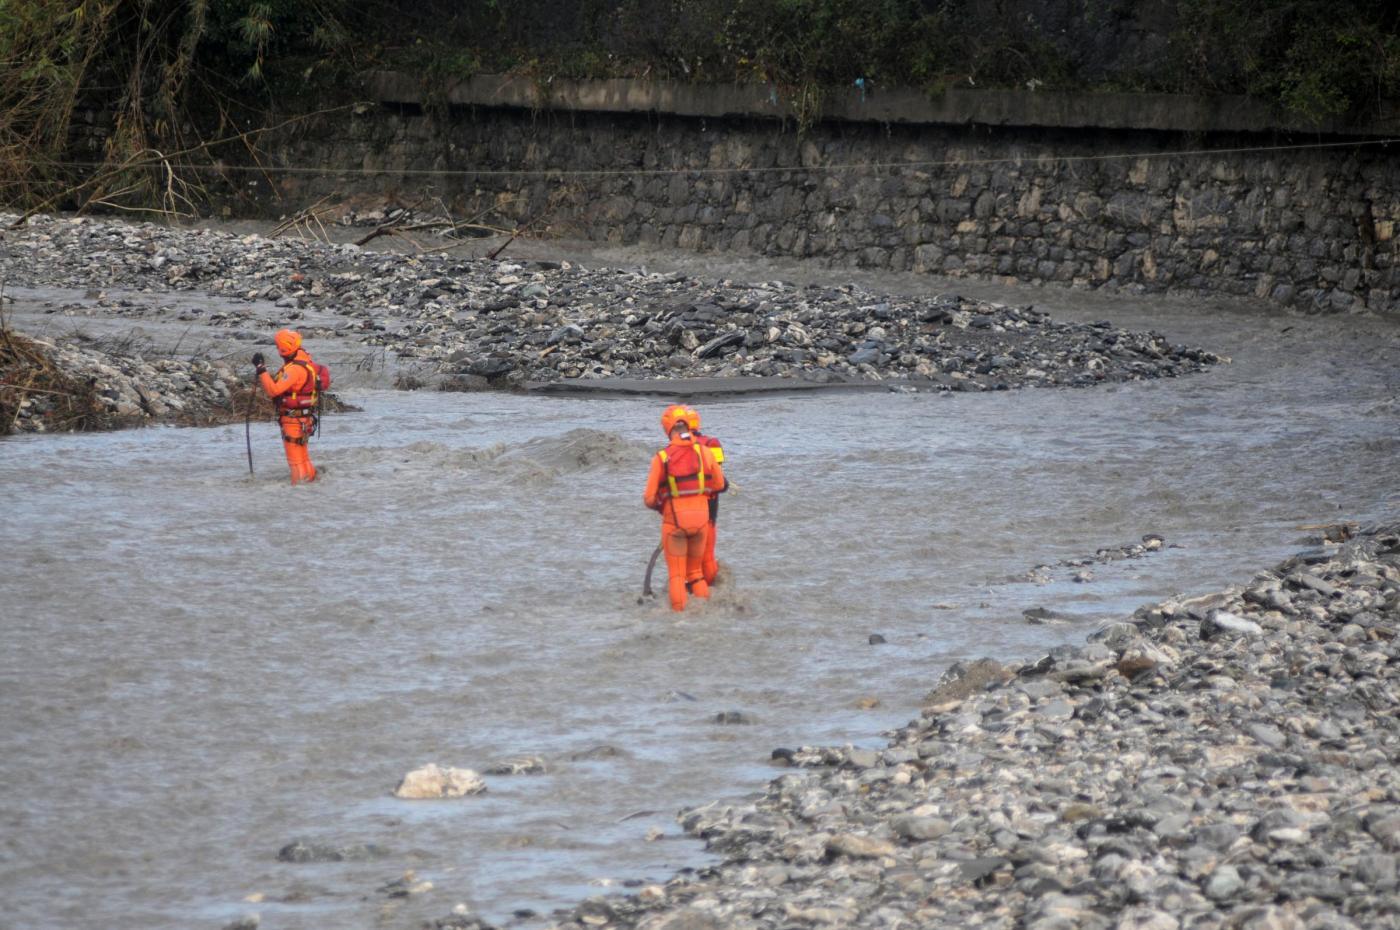 Meteo Liguria, Genova affronta già l'allerta alluvione?